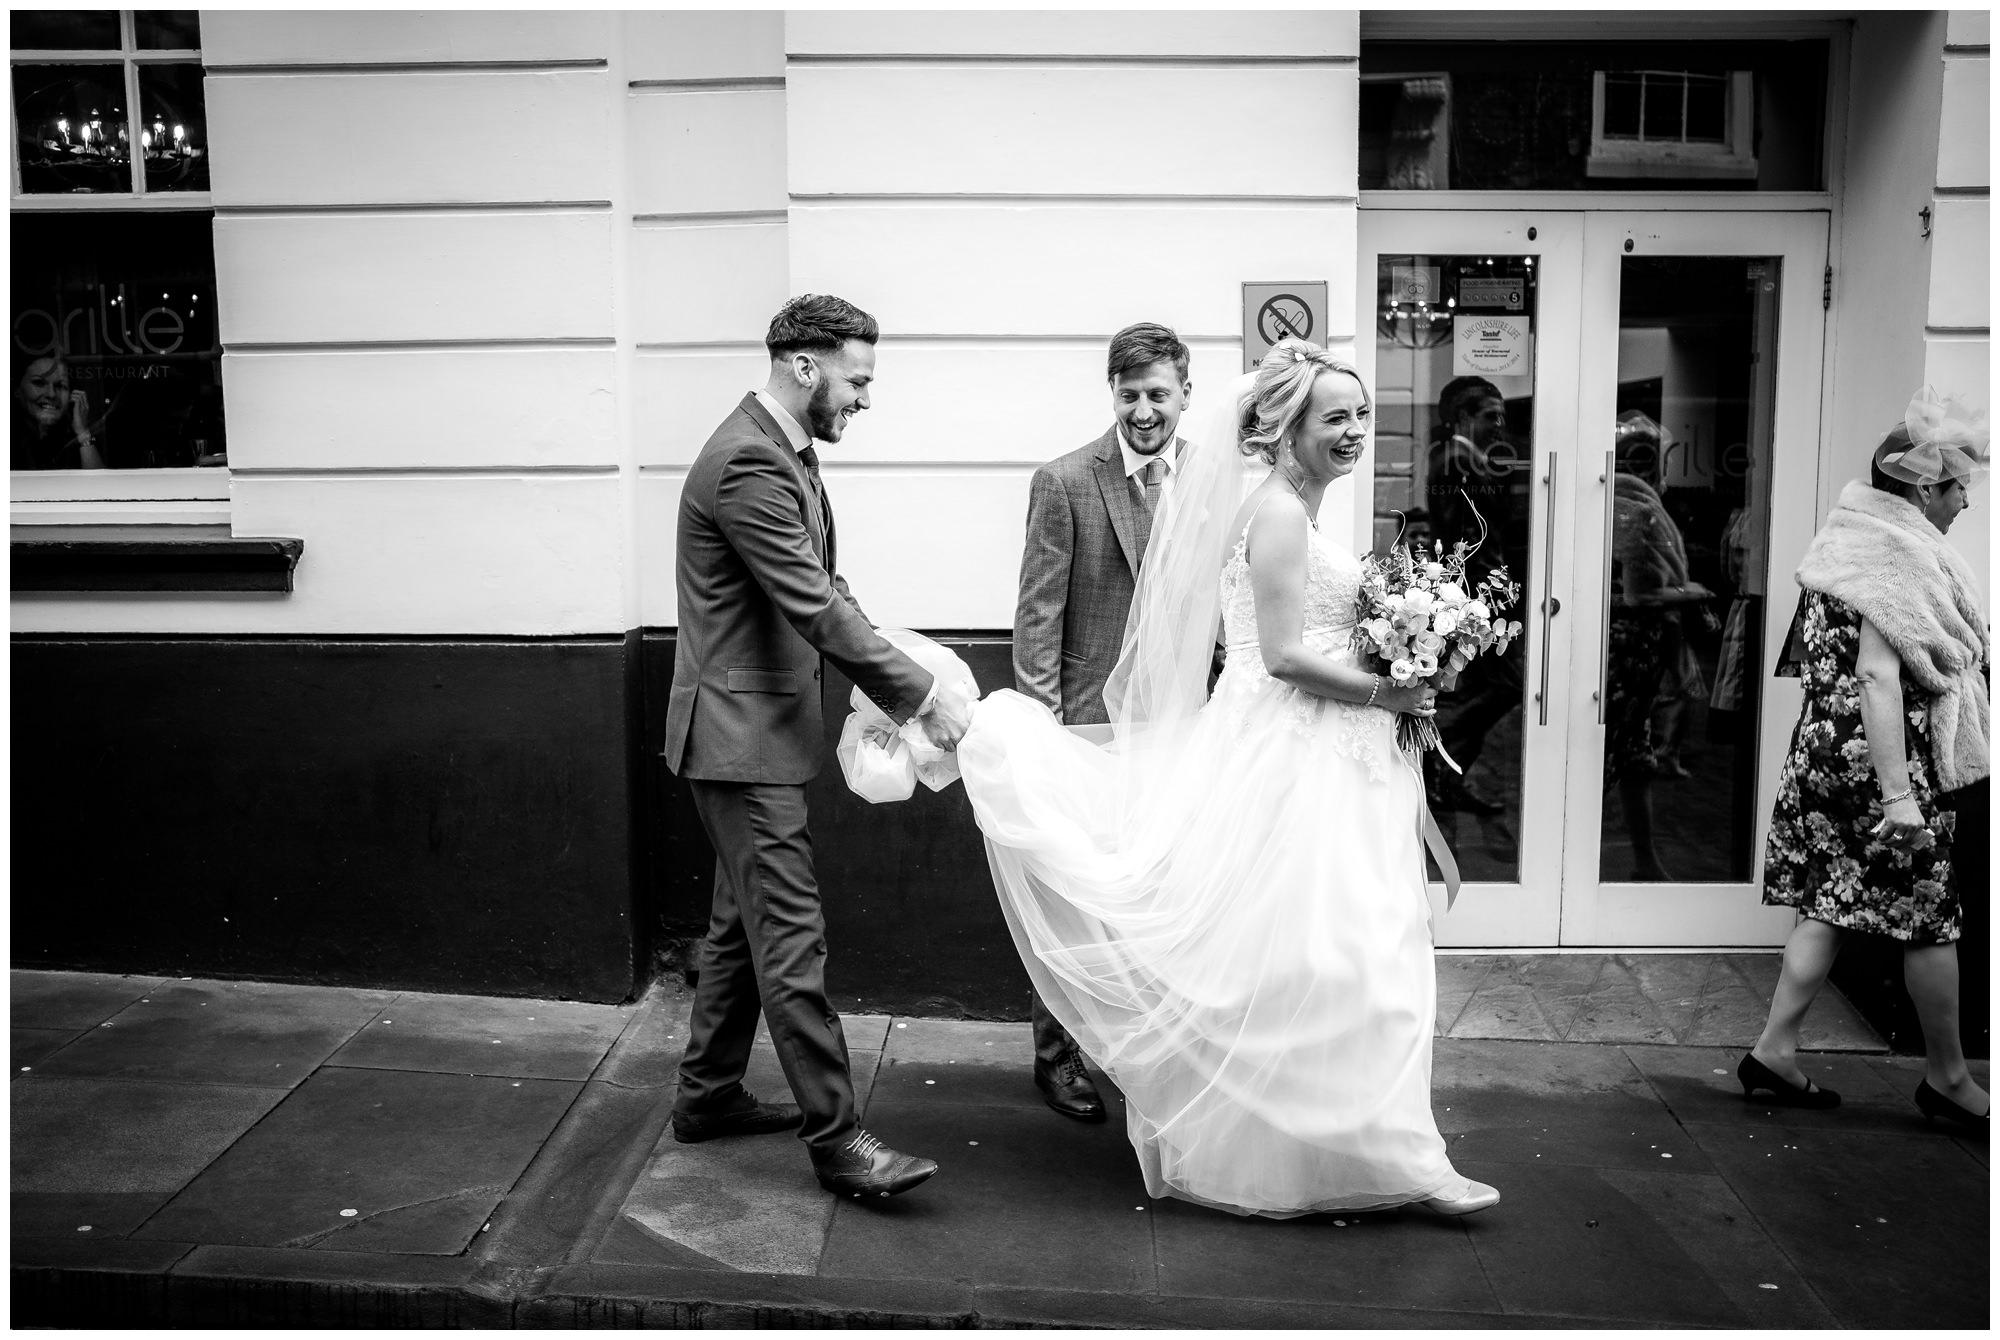 wedding guest carrying dress